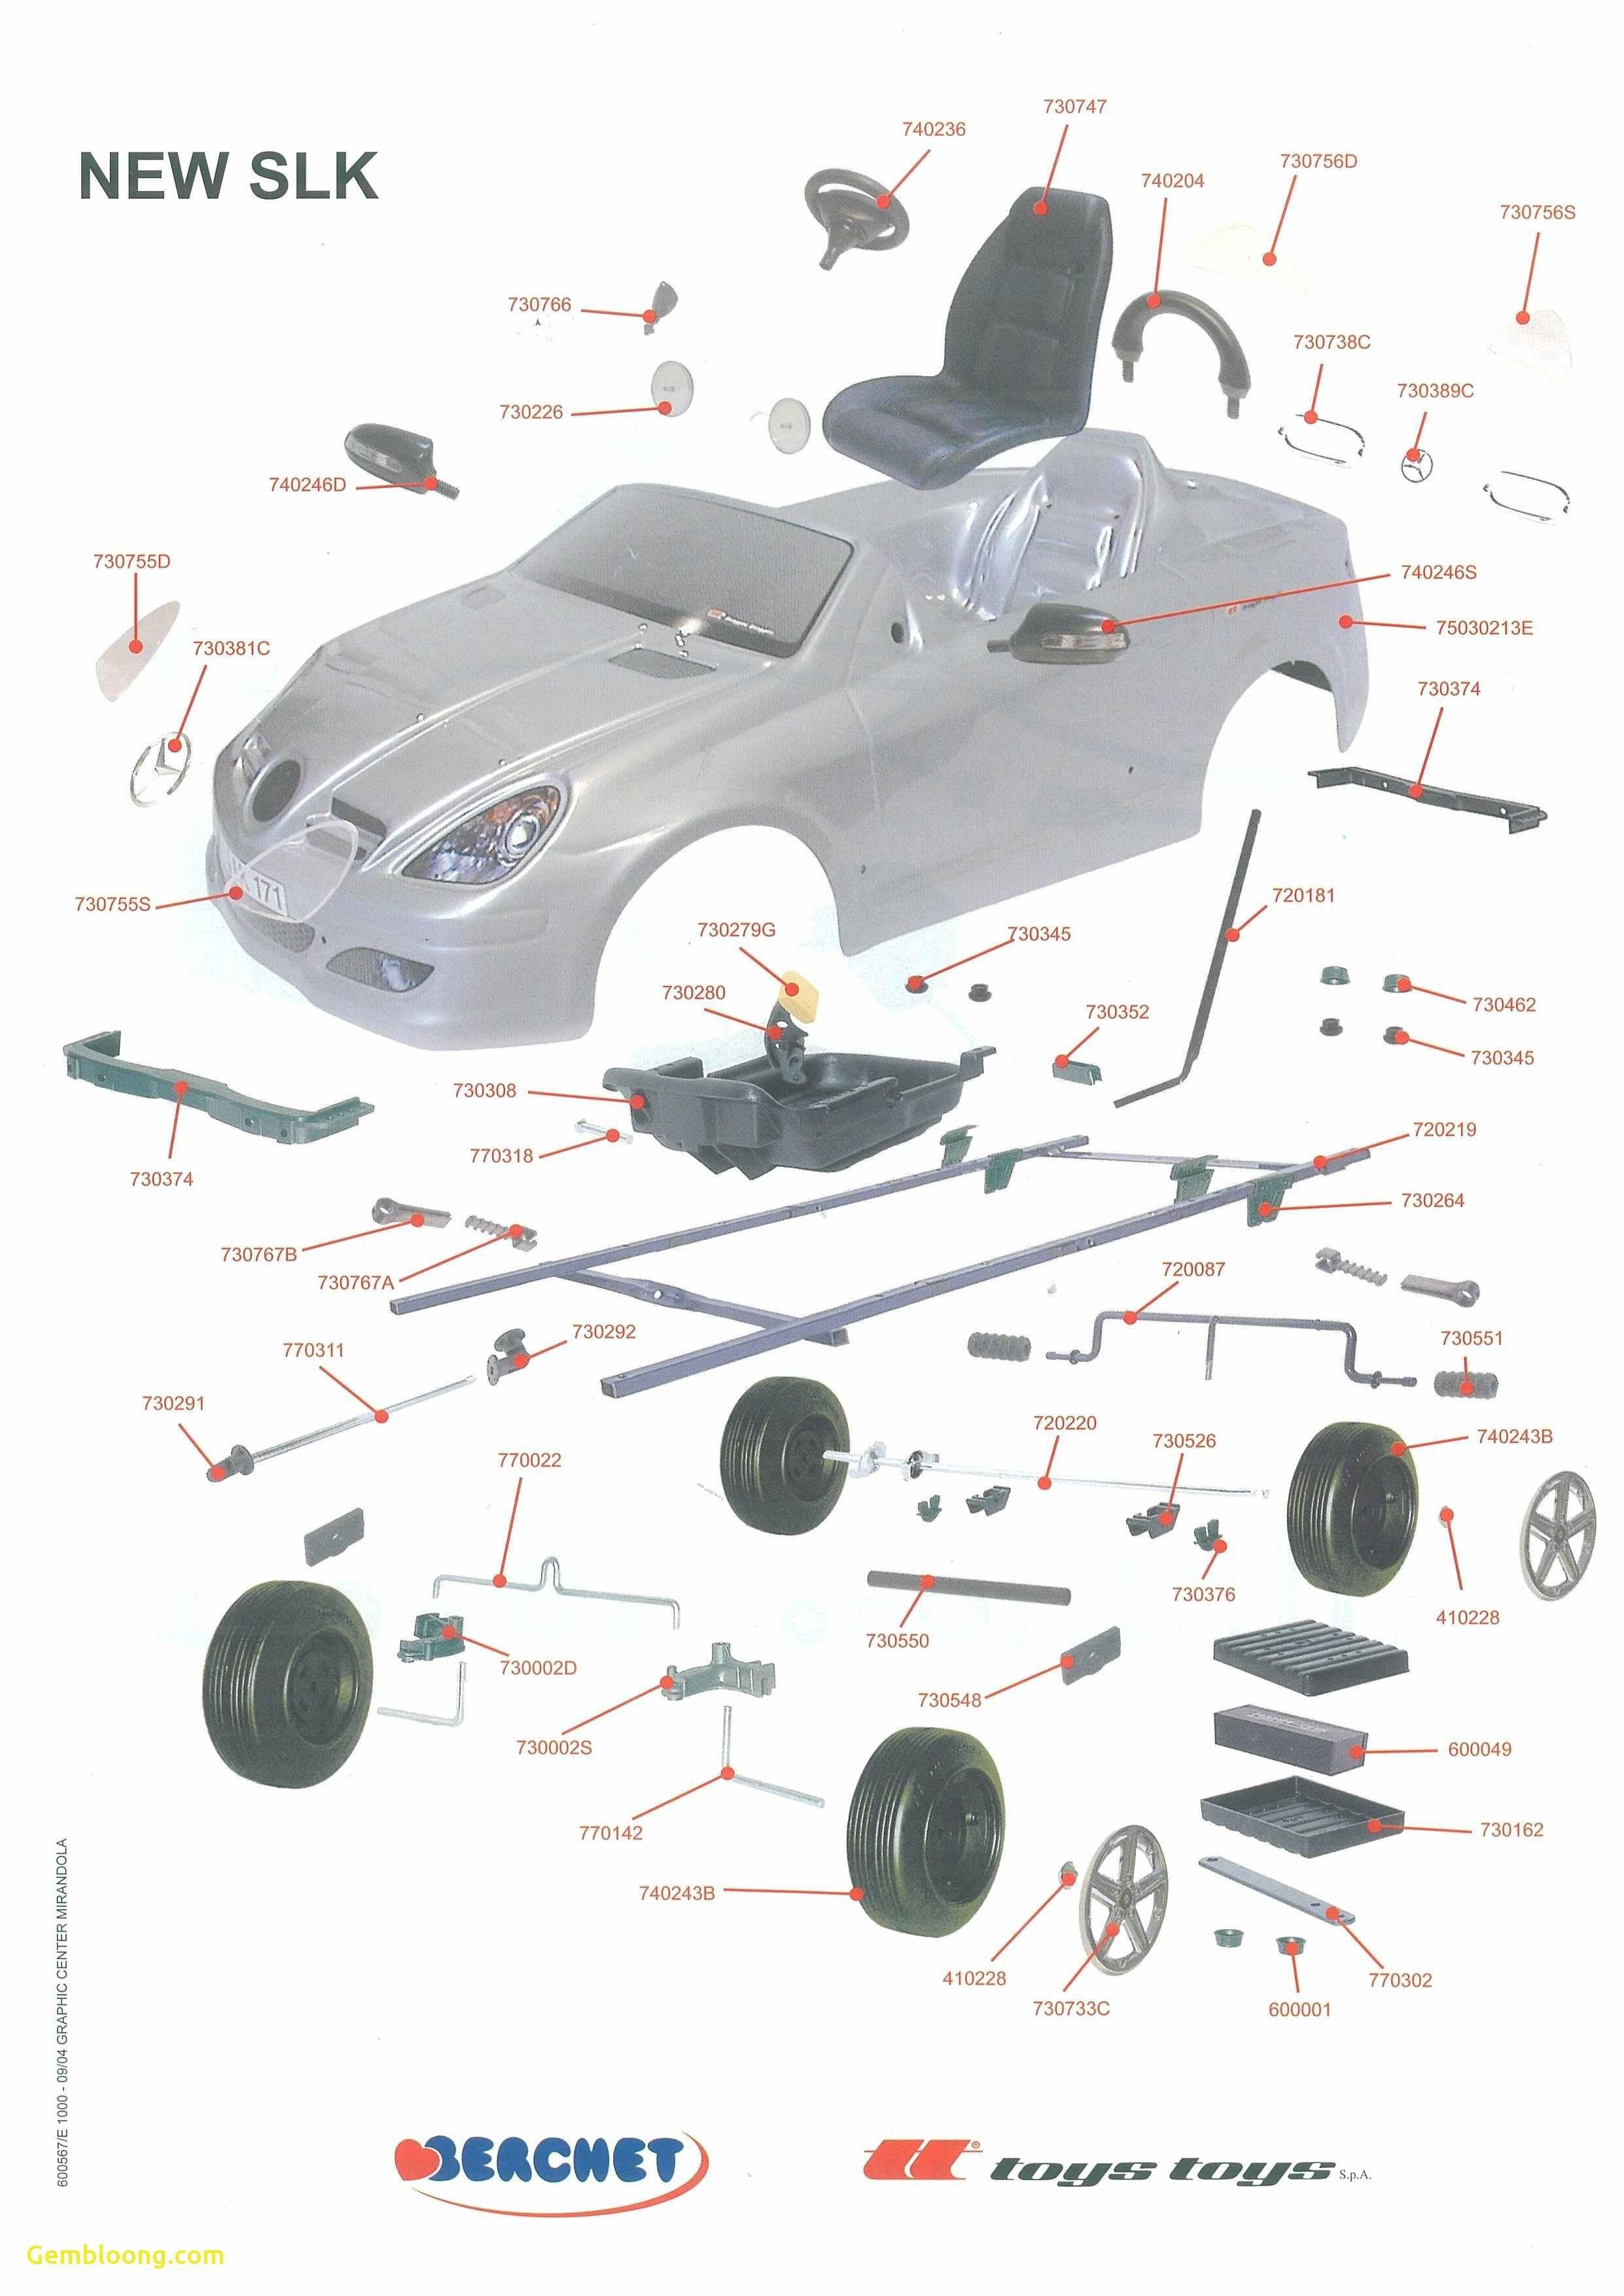 Diagram Of Car Underside Awesome Car Free Body Diagram – My Wiring ...